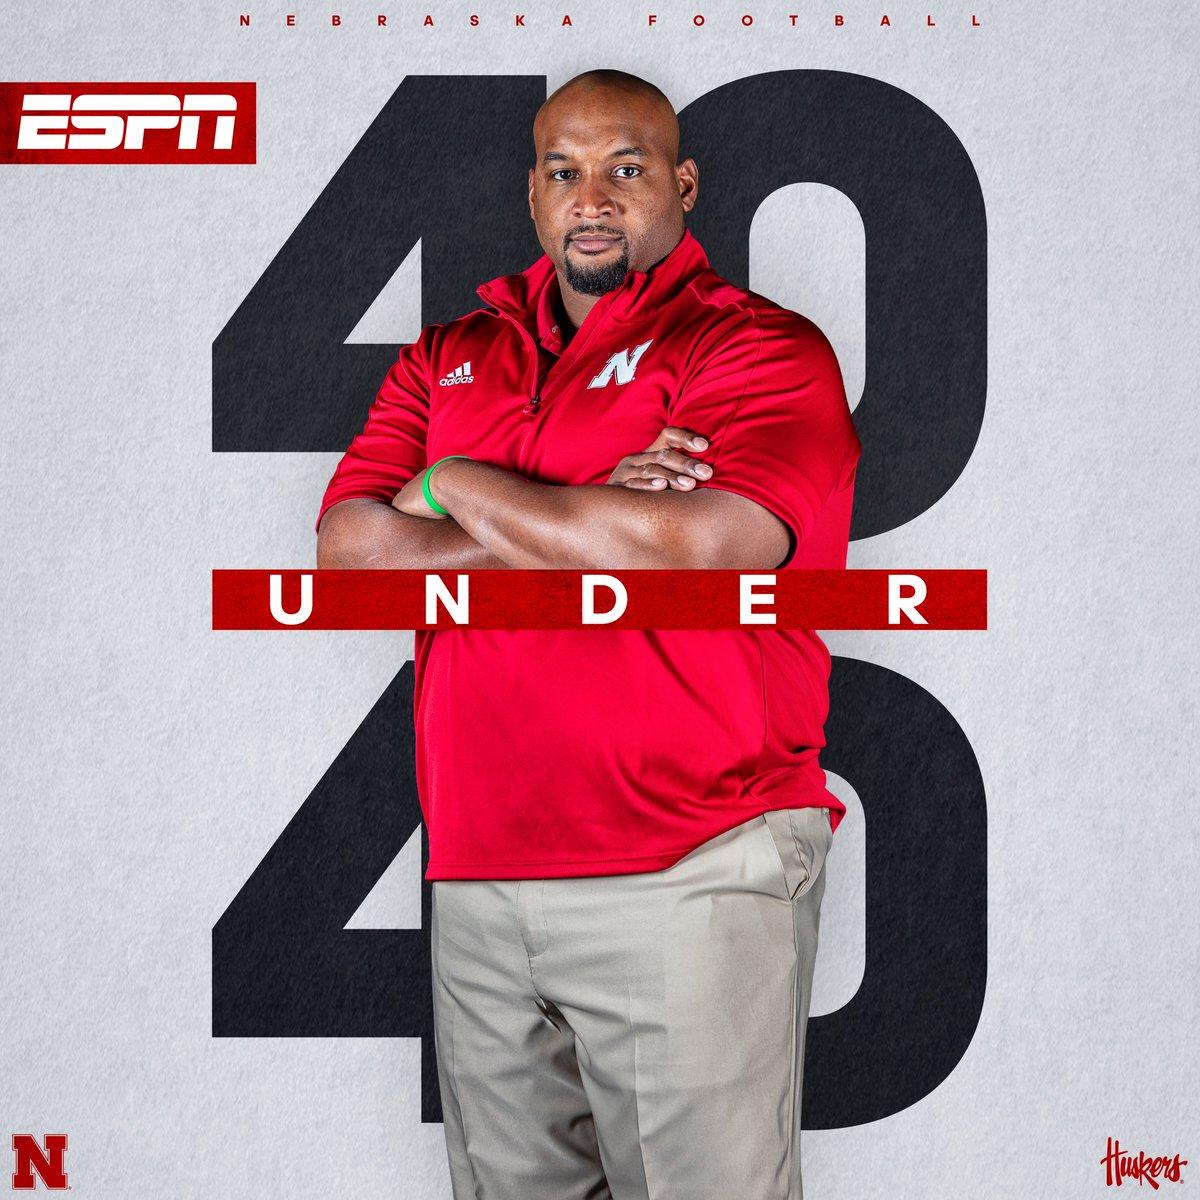 College football's 40 under 40. 👀 Shoutout to @GregAustin2717! 🔗: es.pn/2Me5yar